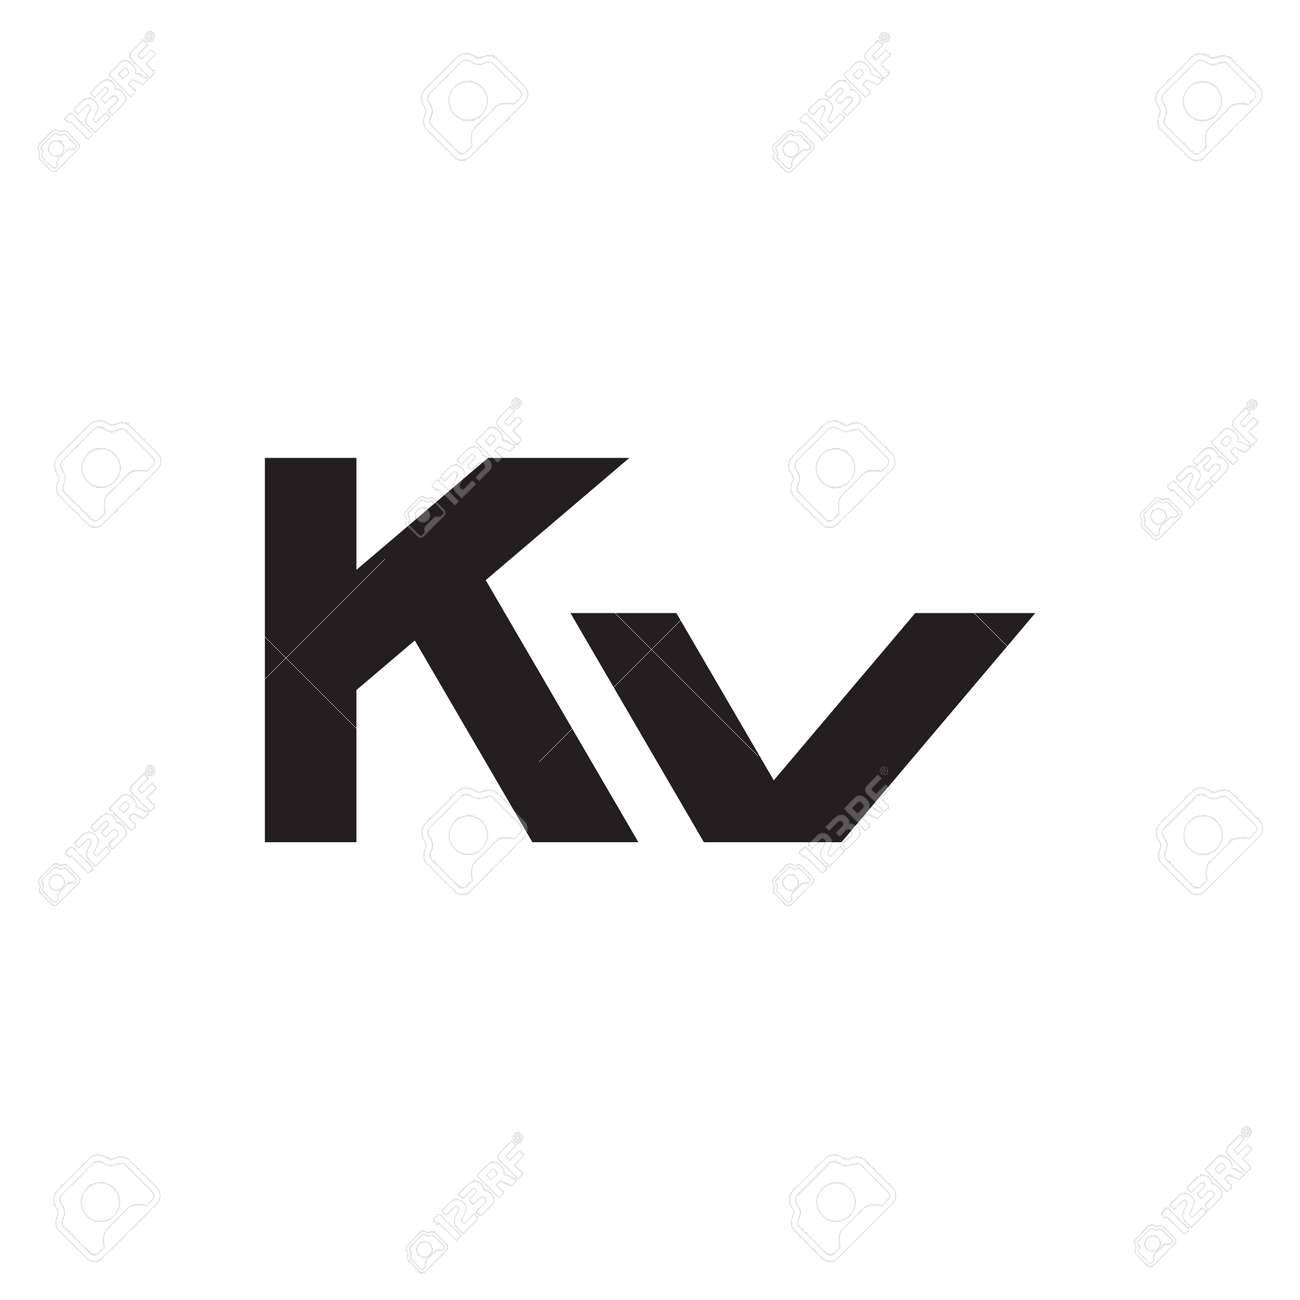 kv initial letter vector logo icon - 157312914